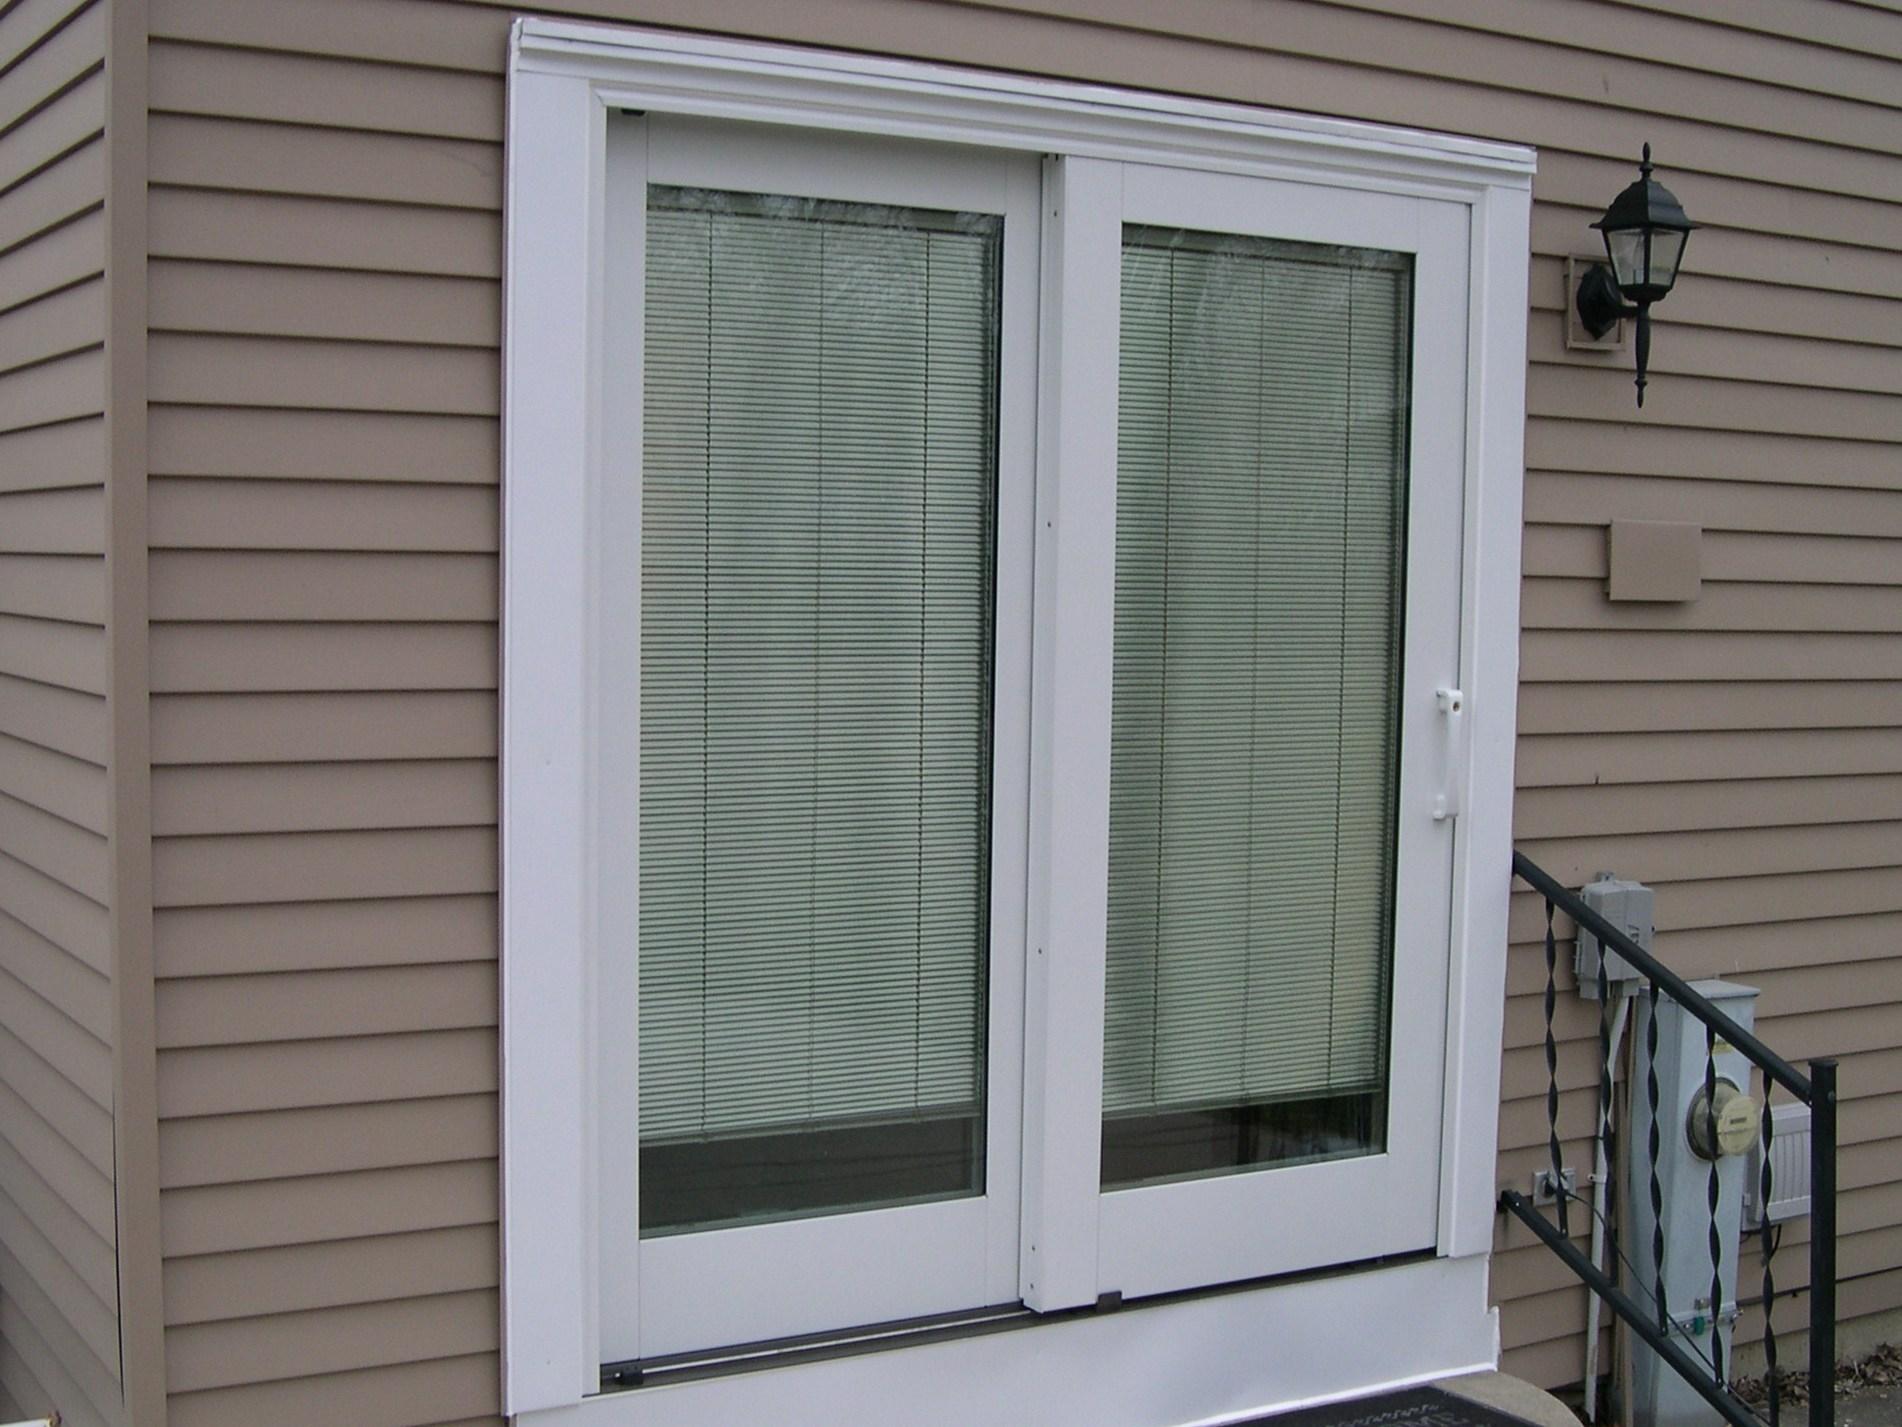 Pella Sliding Glass Door With Blinds Inside